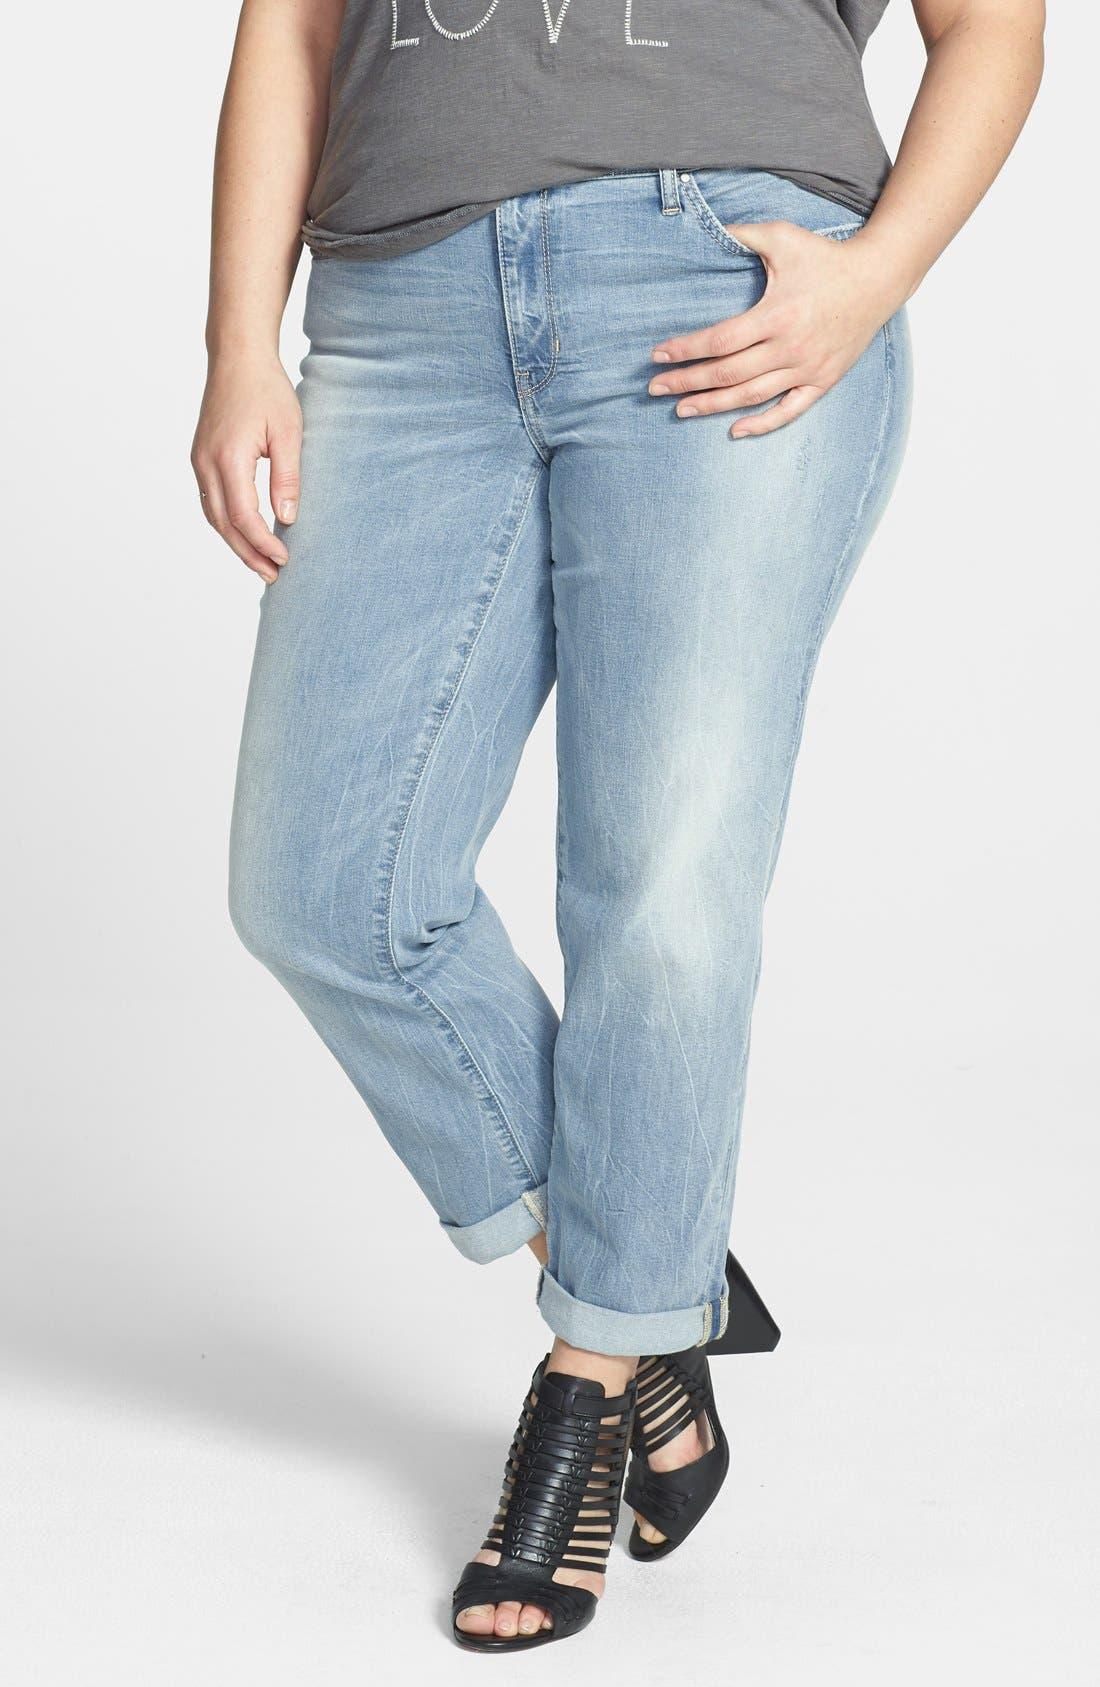 Main Image - DKNY 'Bleecker' Boyfriend Jeans (Icy Brook) (Plus Size)